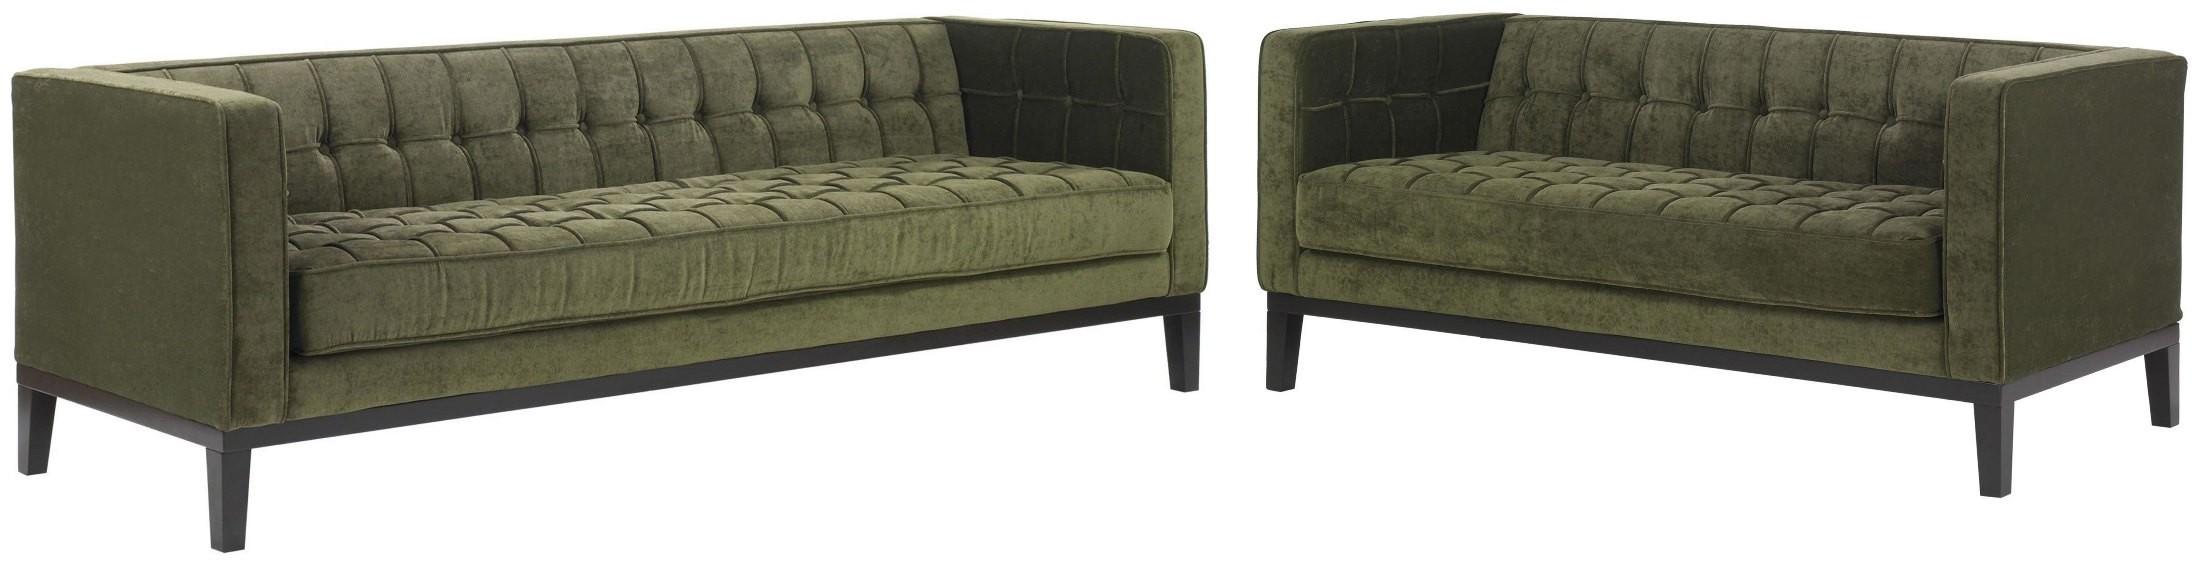 Roxbury Tufted Green Fabric Living Room Set Lc10103gr